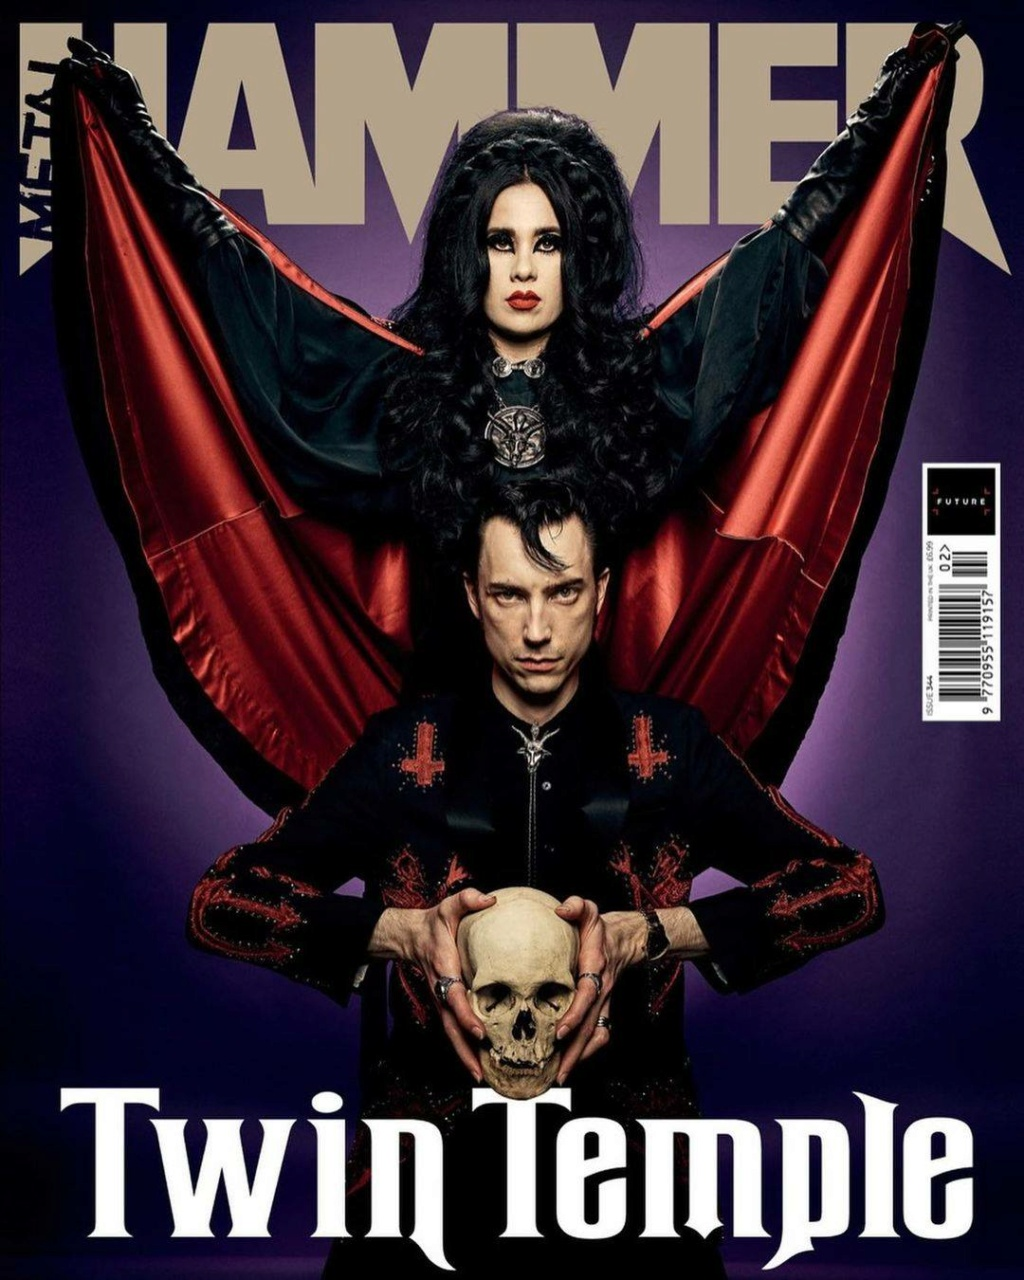 Twin Temple -  Doo Wop satánico y feminista de L.A. 1b147